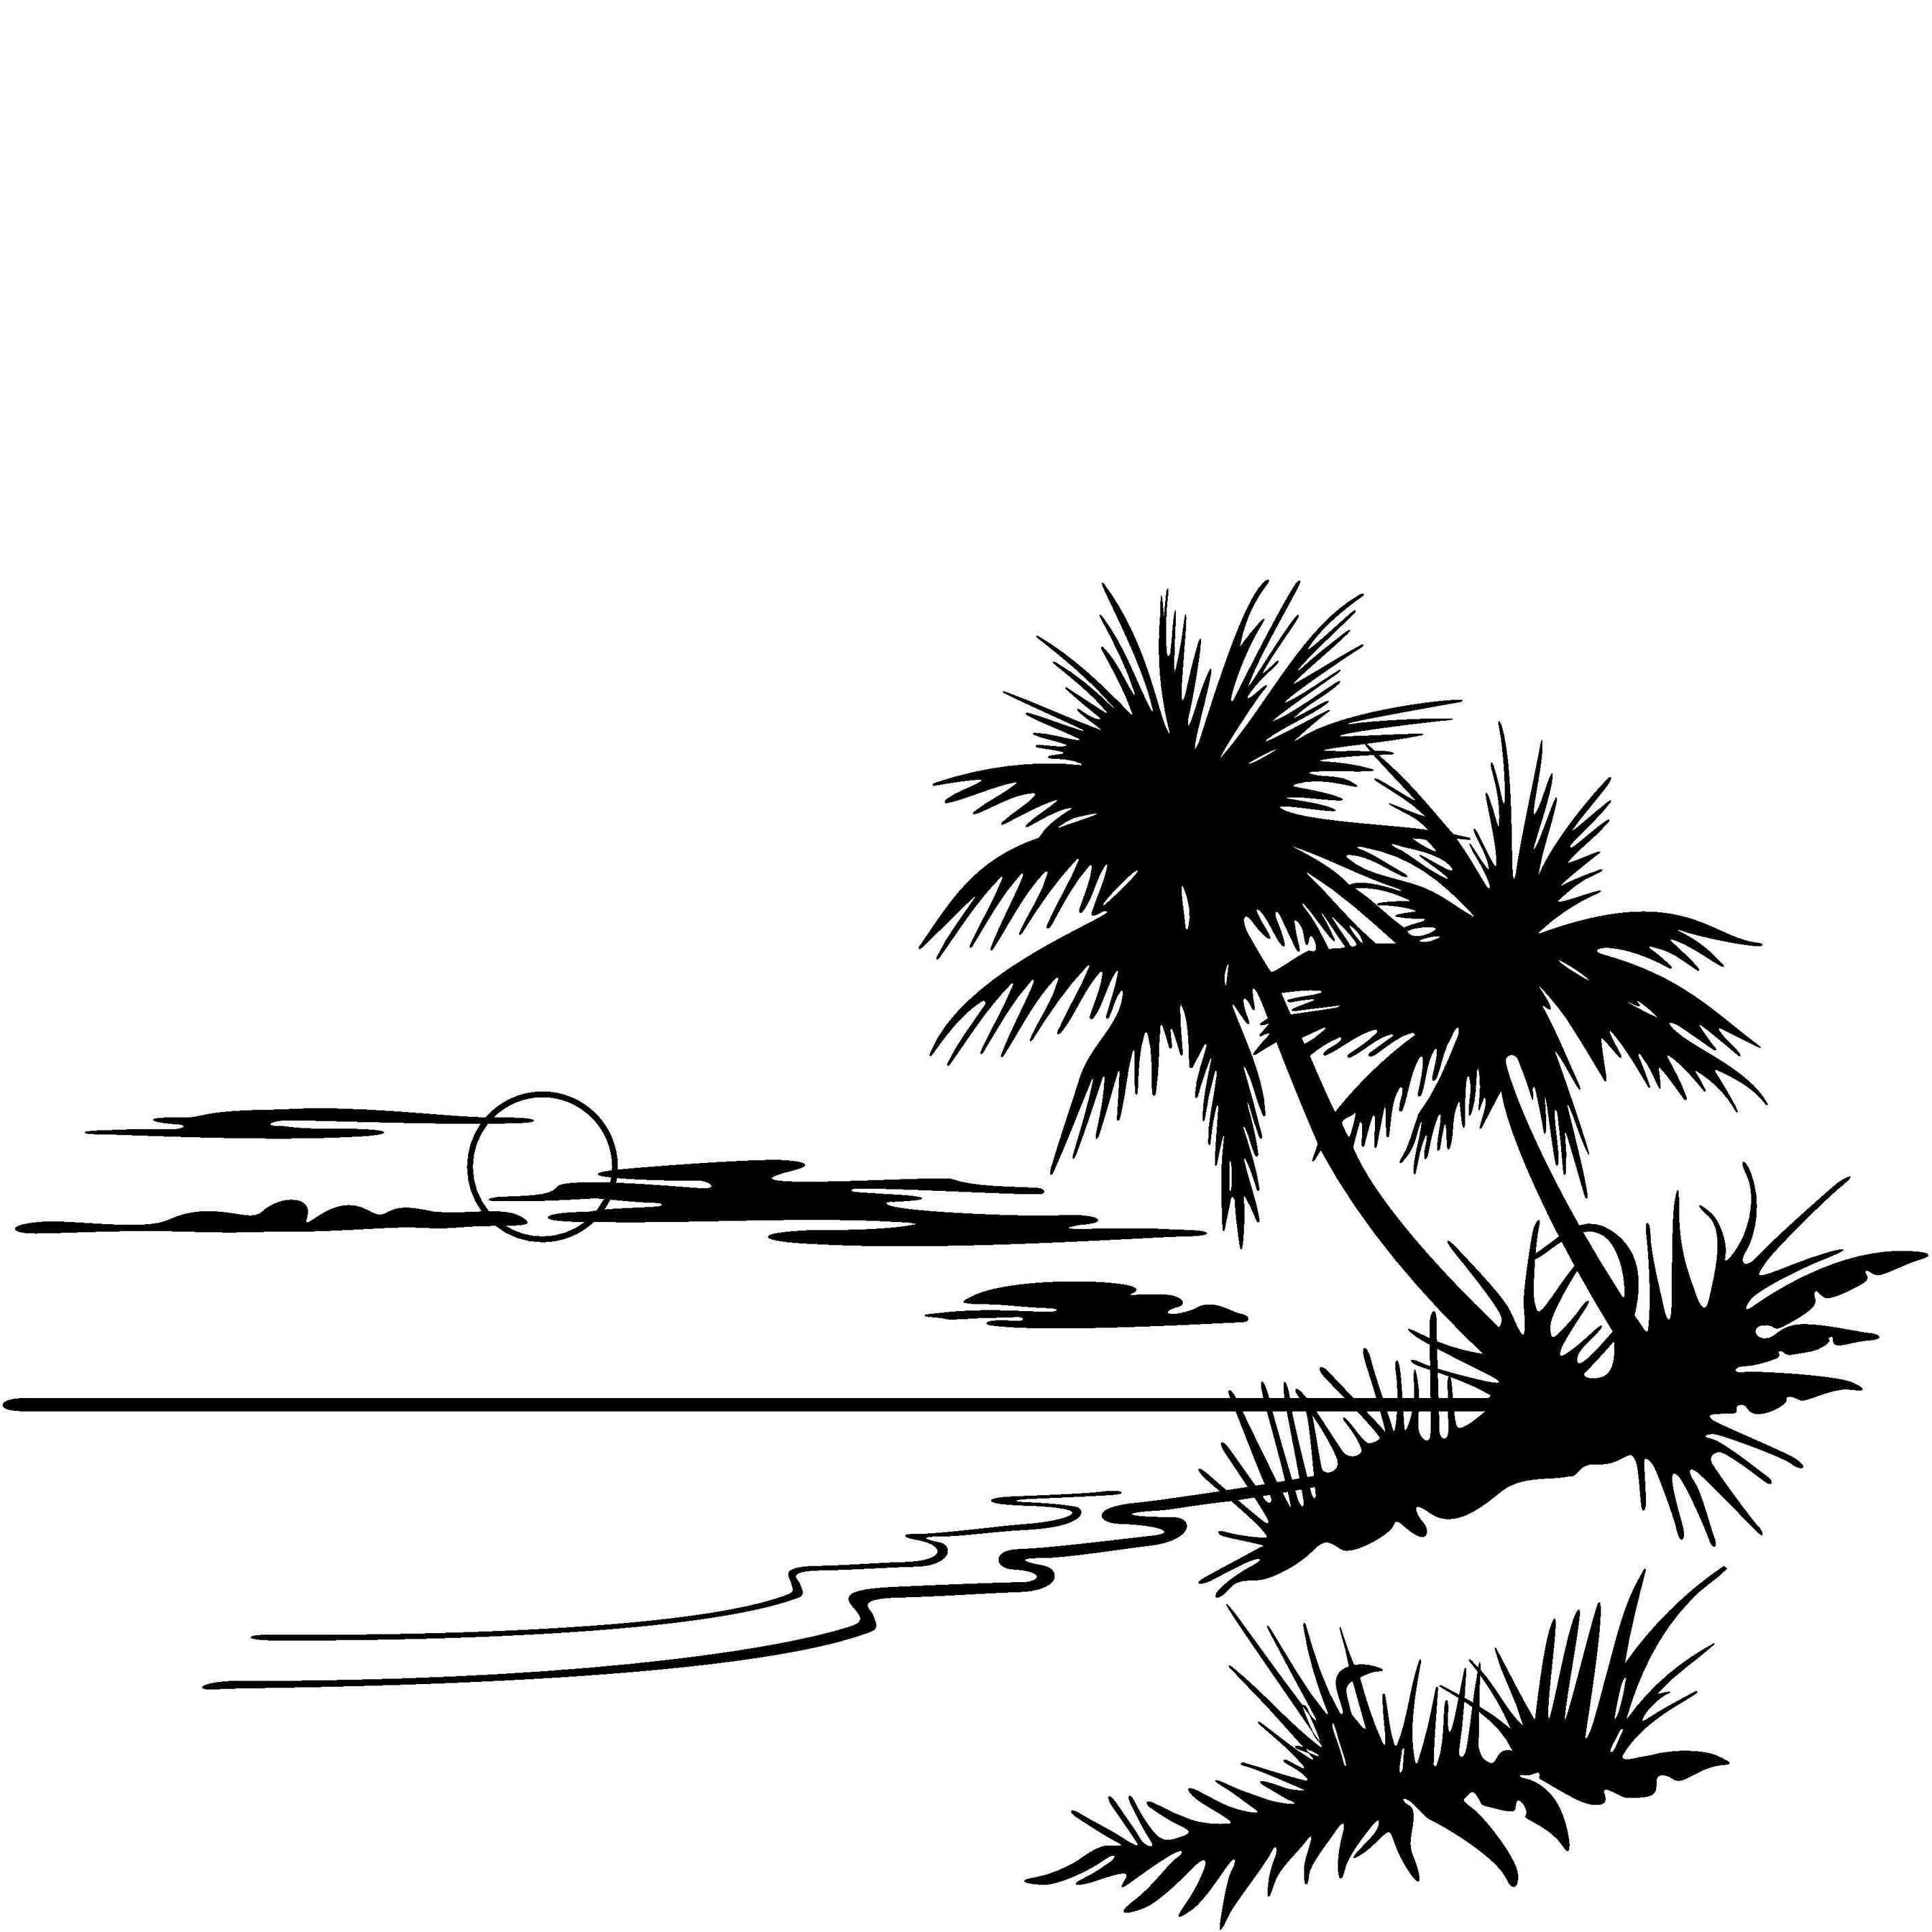 Clipart beach drawing, Clipart beach drawing Transparent